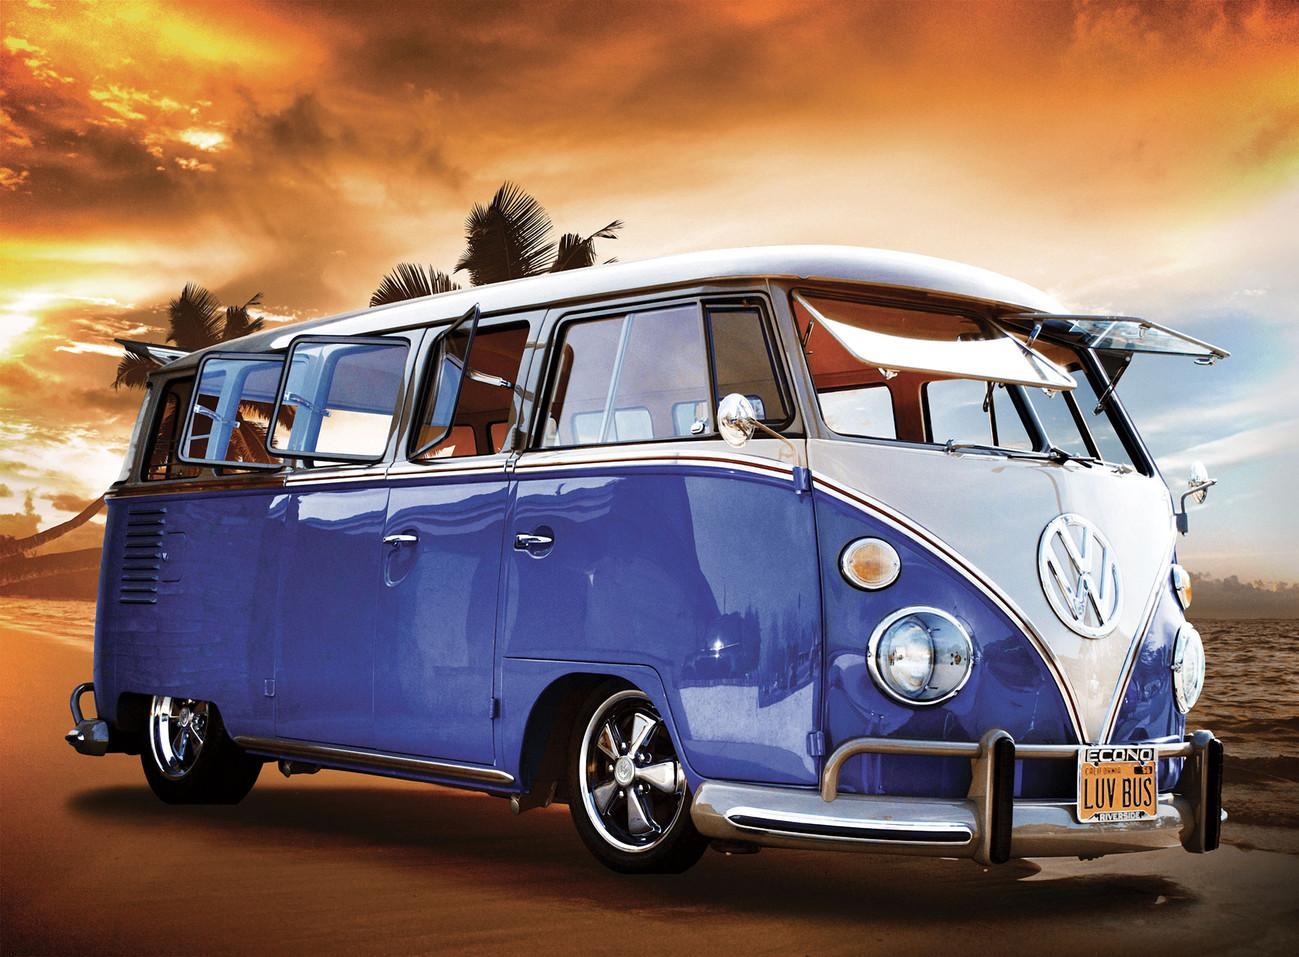 volkswagen camper van sunset wall mural buy at. Black Bedroom Furniture Sets. Home Design Ideas